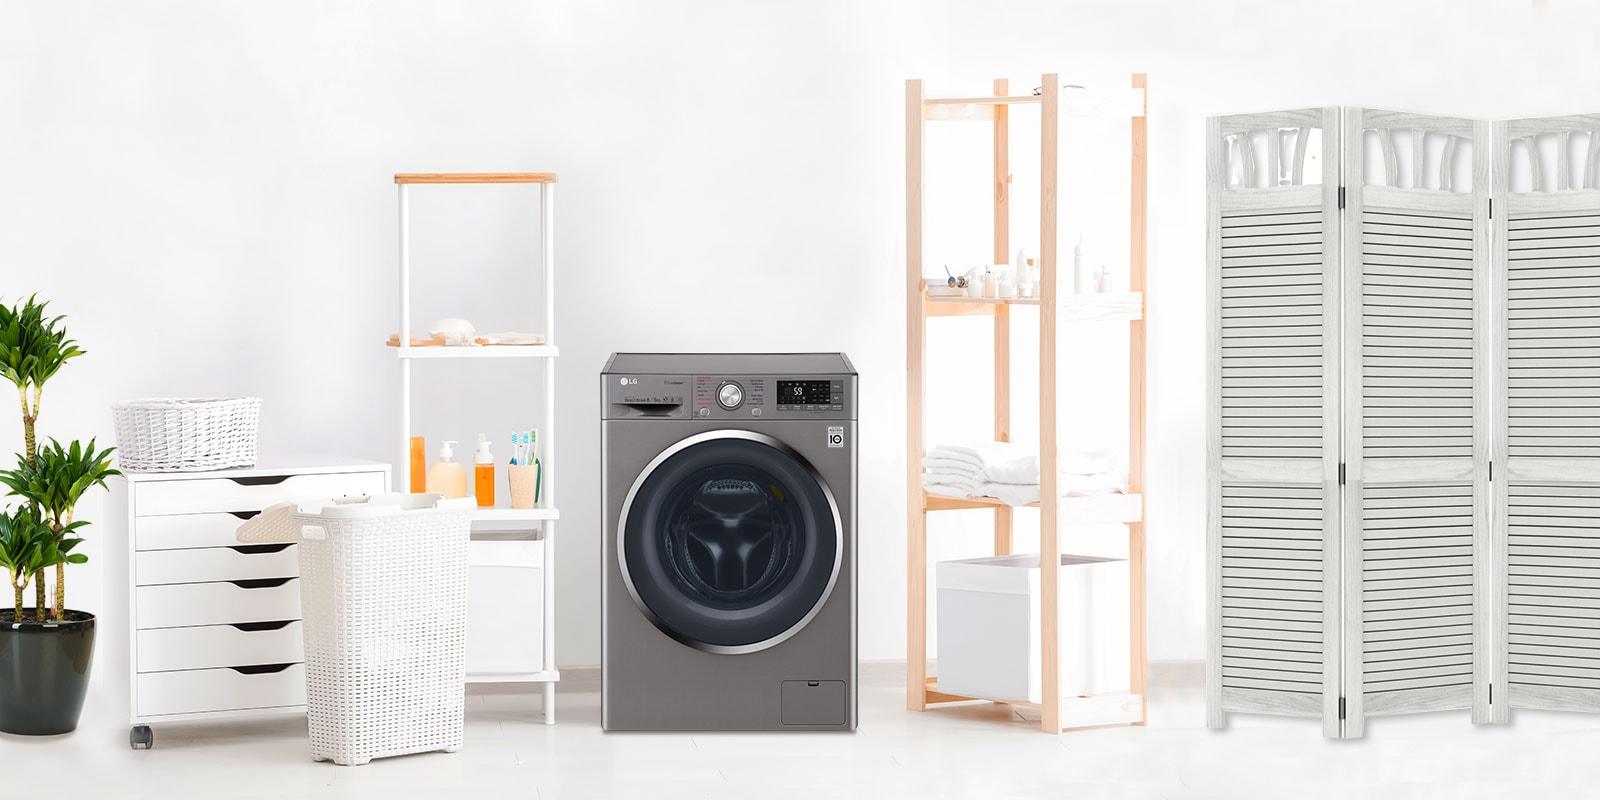 Washer Dryer Combo: Space-Saving Efficiency | LG Sri Lanka